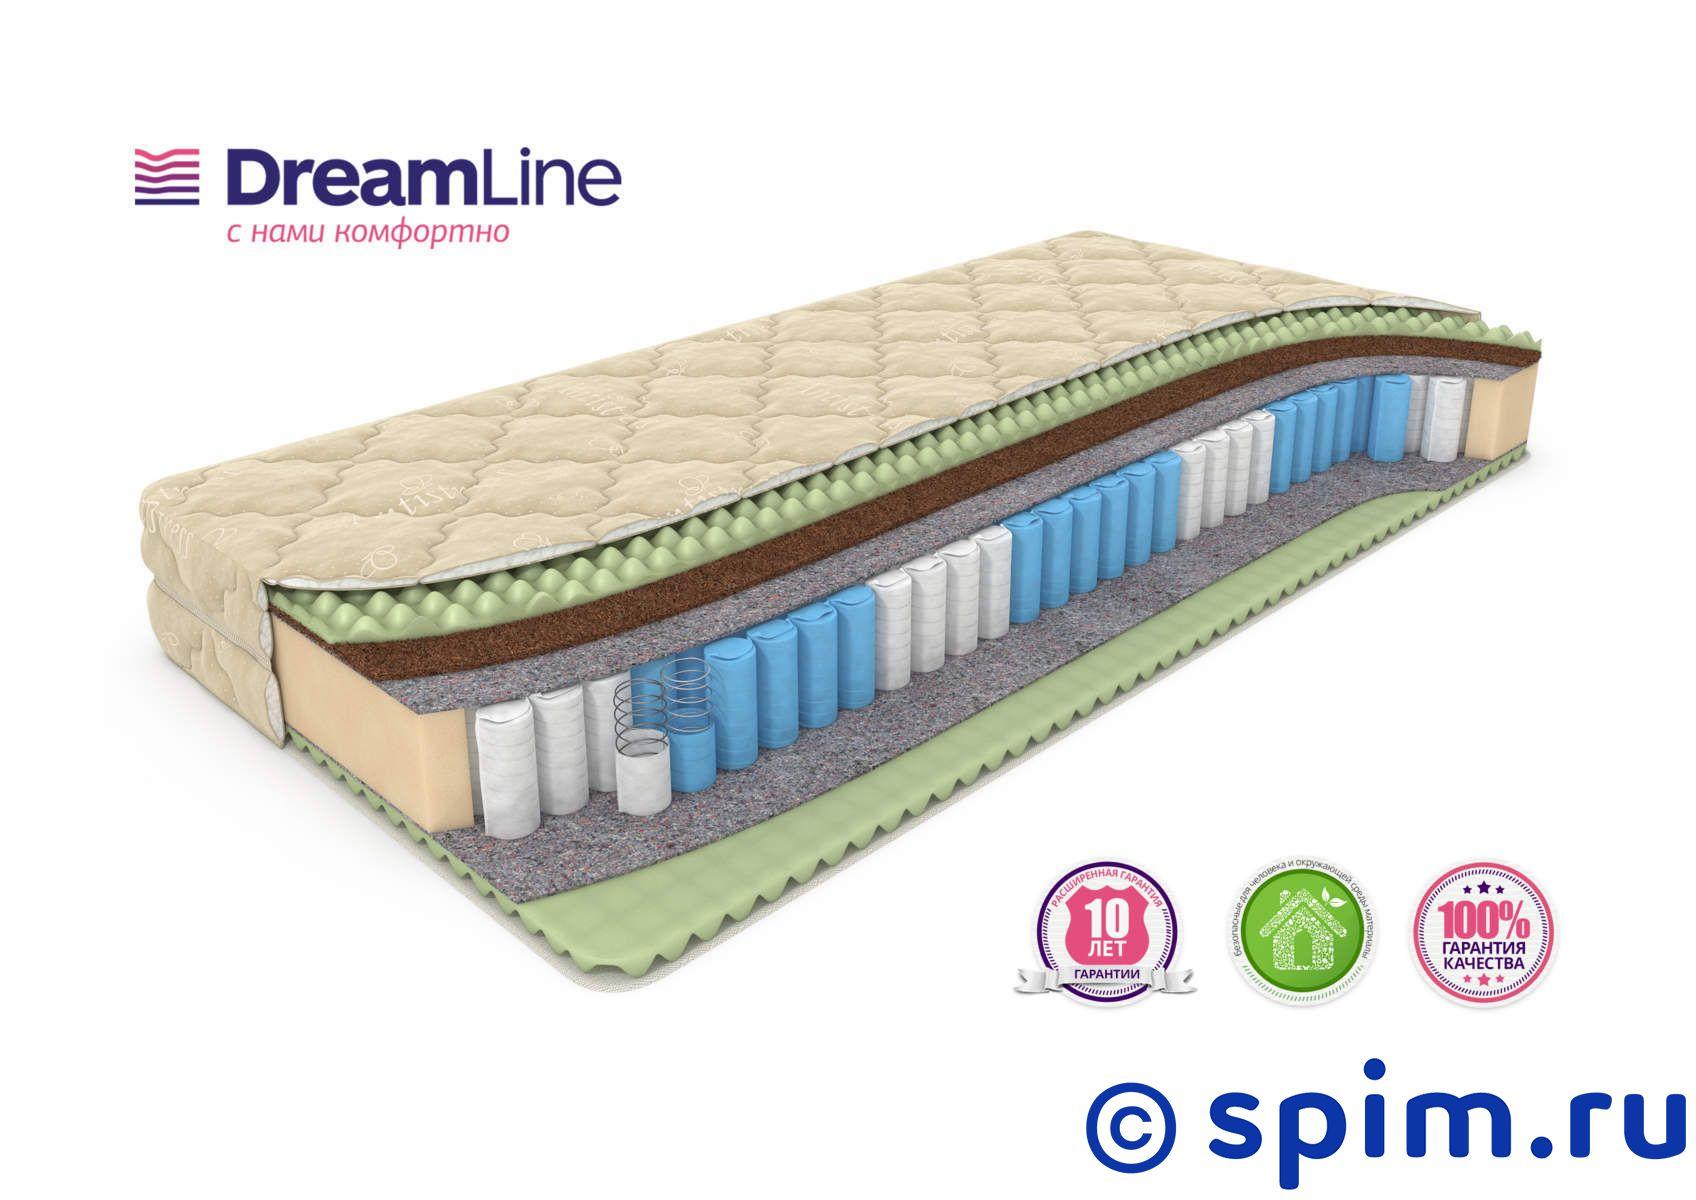 Матрас DreamLine Mix Foam Smart Zone 200х190 см